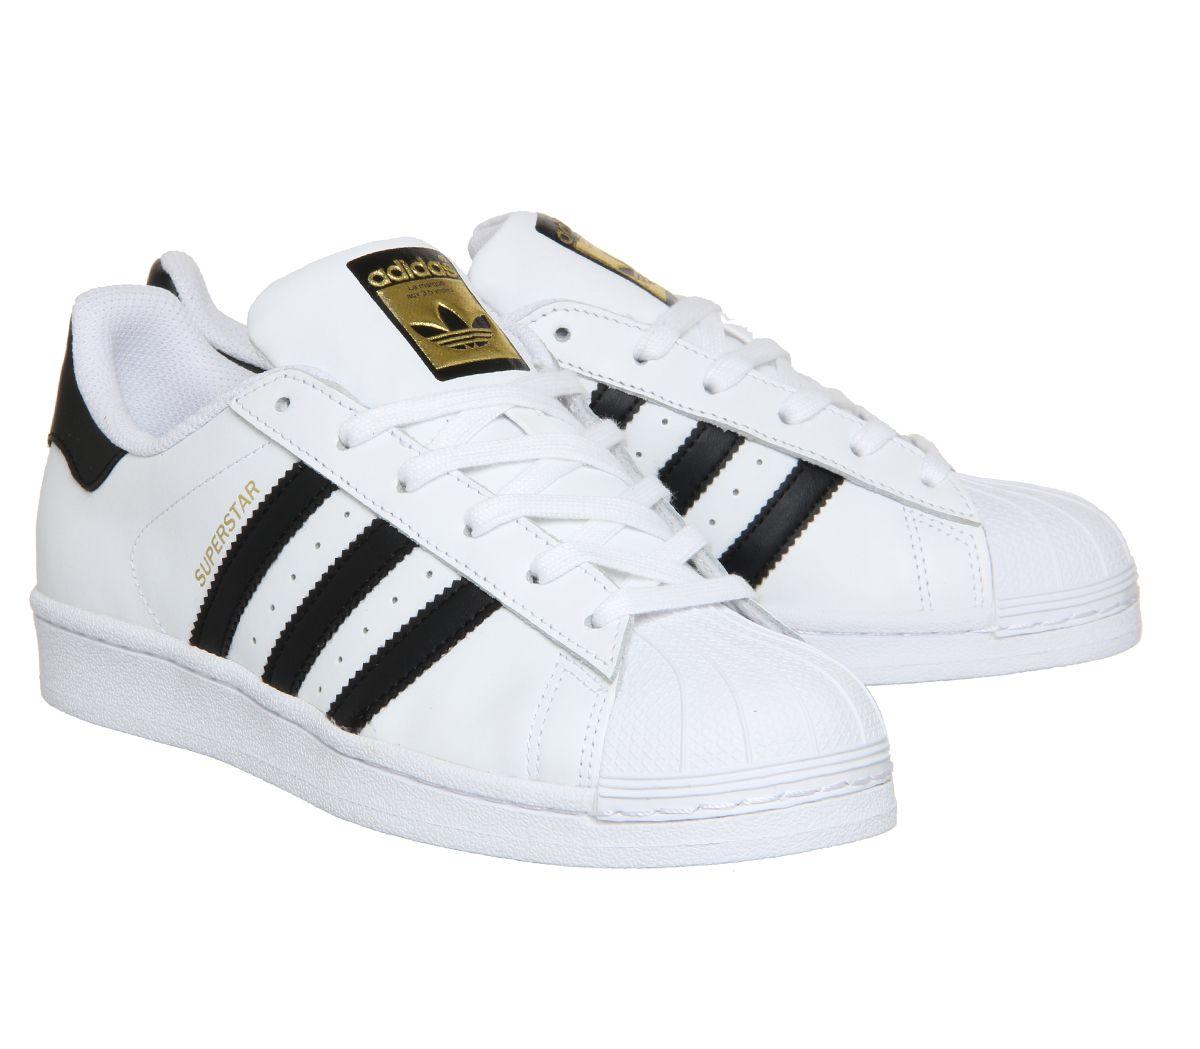 chaussures de sport 18a0f a7923 Détails sur Femmes adidas Superstar Baskets Blanc Noir Foundation Baskets